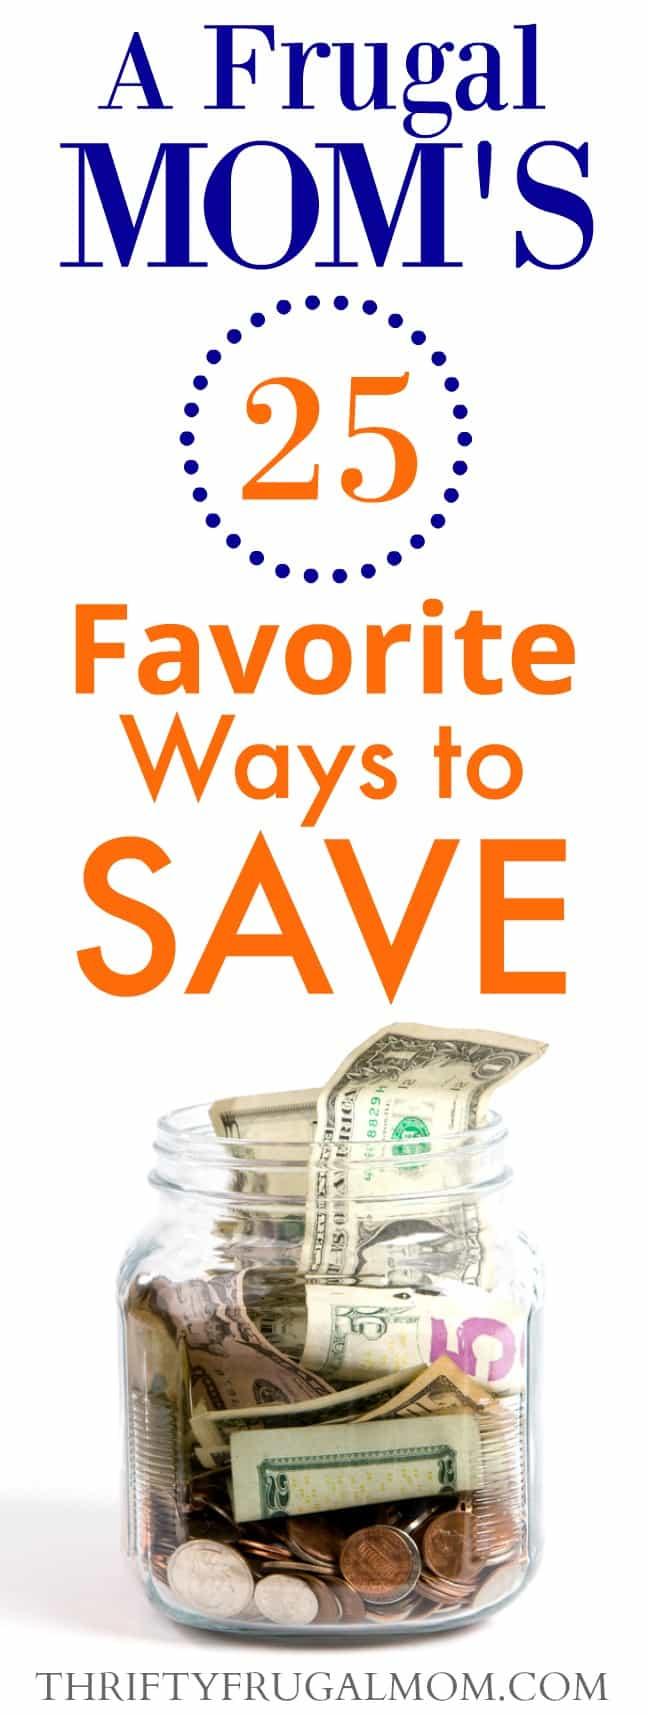 frugal mom's frugal ways to save money